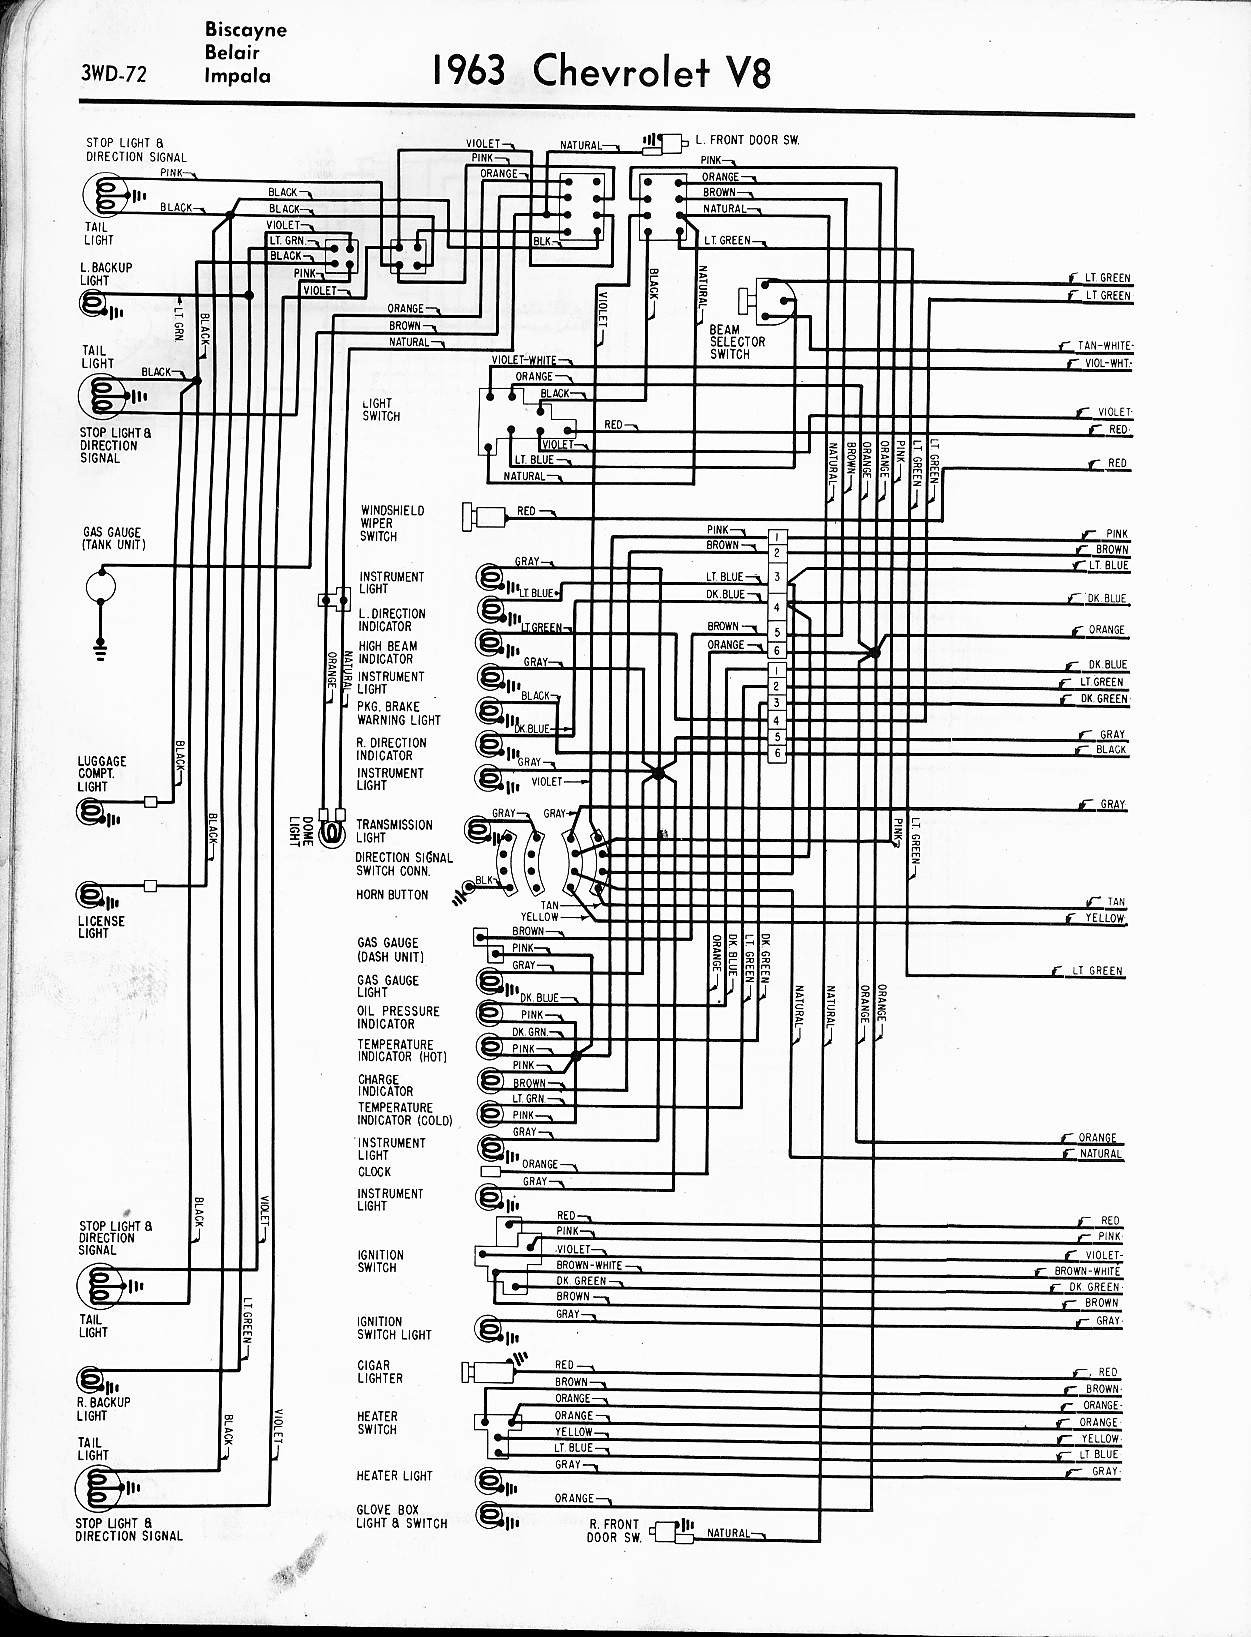 2005 Impala Engine Diagram Chevrolet Chevy Sedan 1964 Chevy Impala Ss Wiring Harness Diagram Of 2005 Impala Engine Diagram